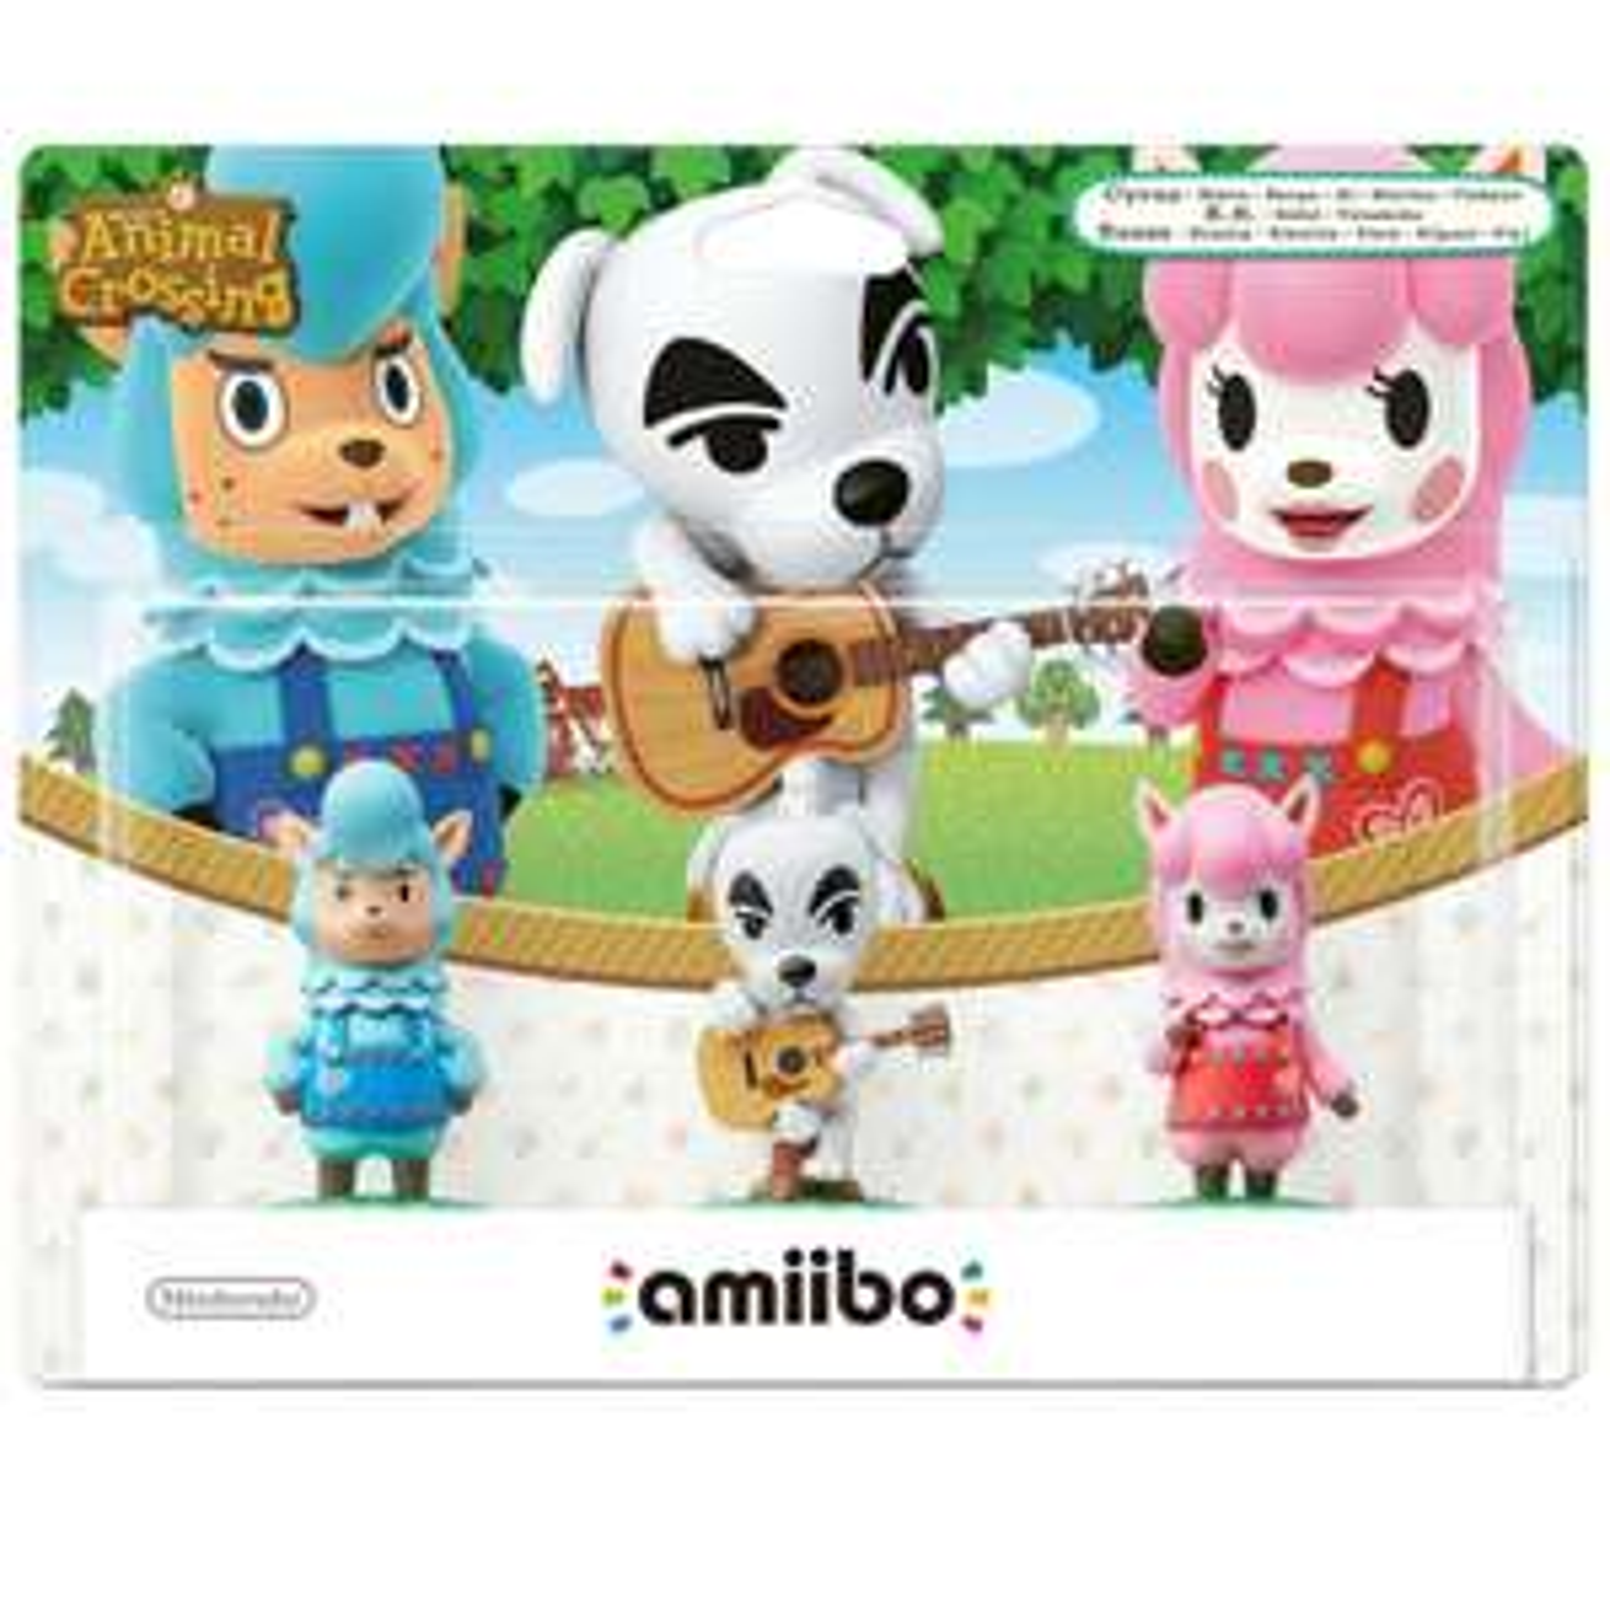 Nintendo amiibo Smash 3 Pack - Reese, K.K. Slider, Cyrus (Nintendo Wii U/3DS) £4.99 Delivered @ Argos via eBay